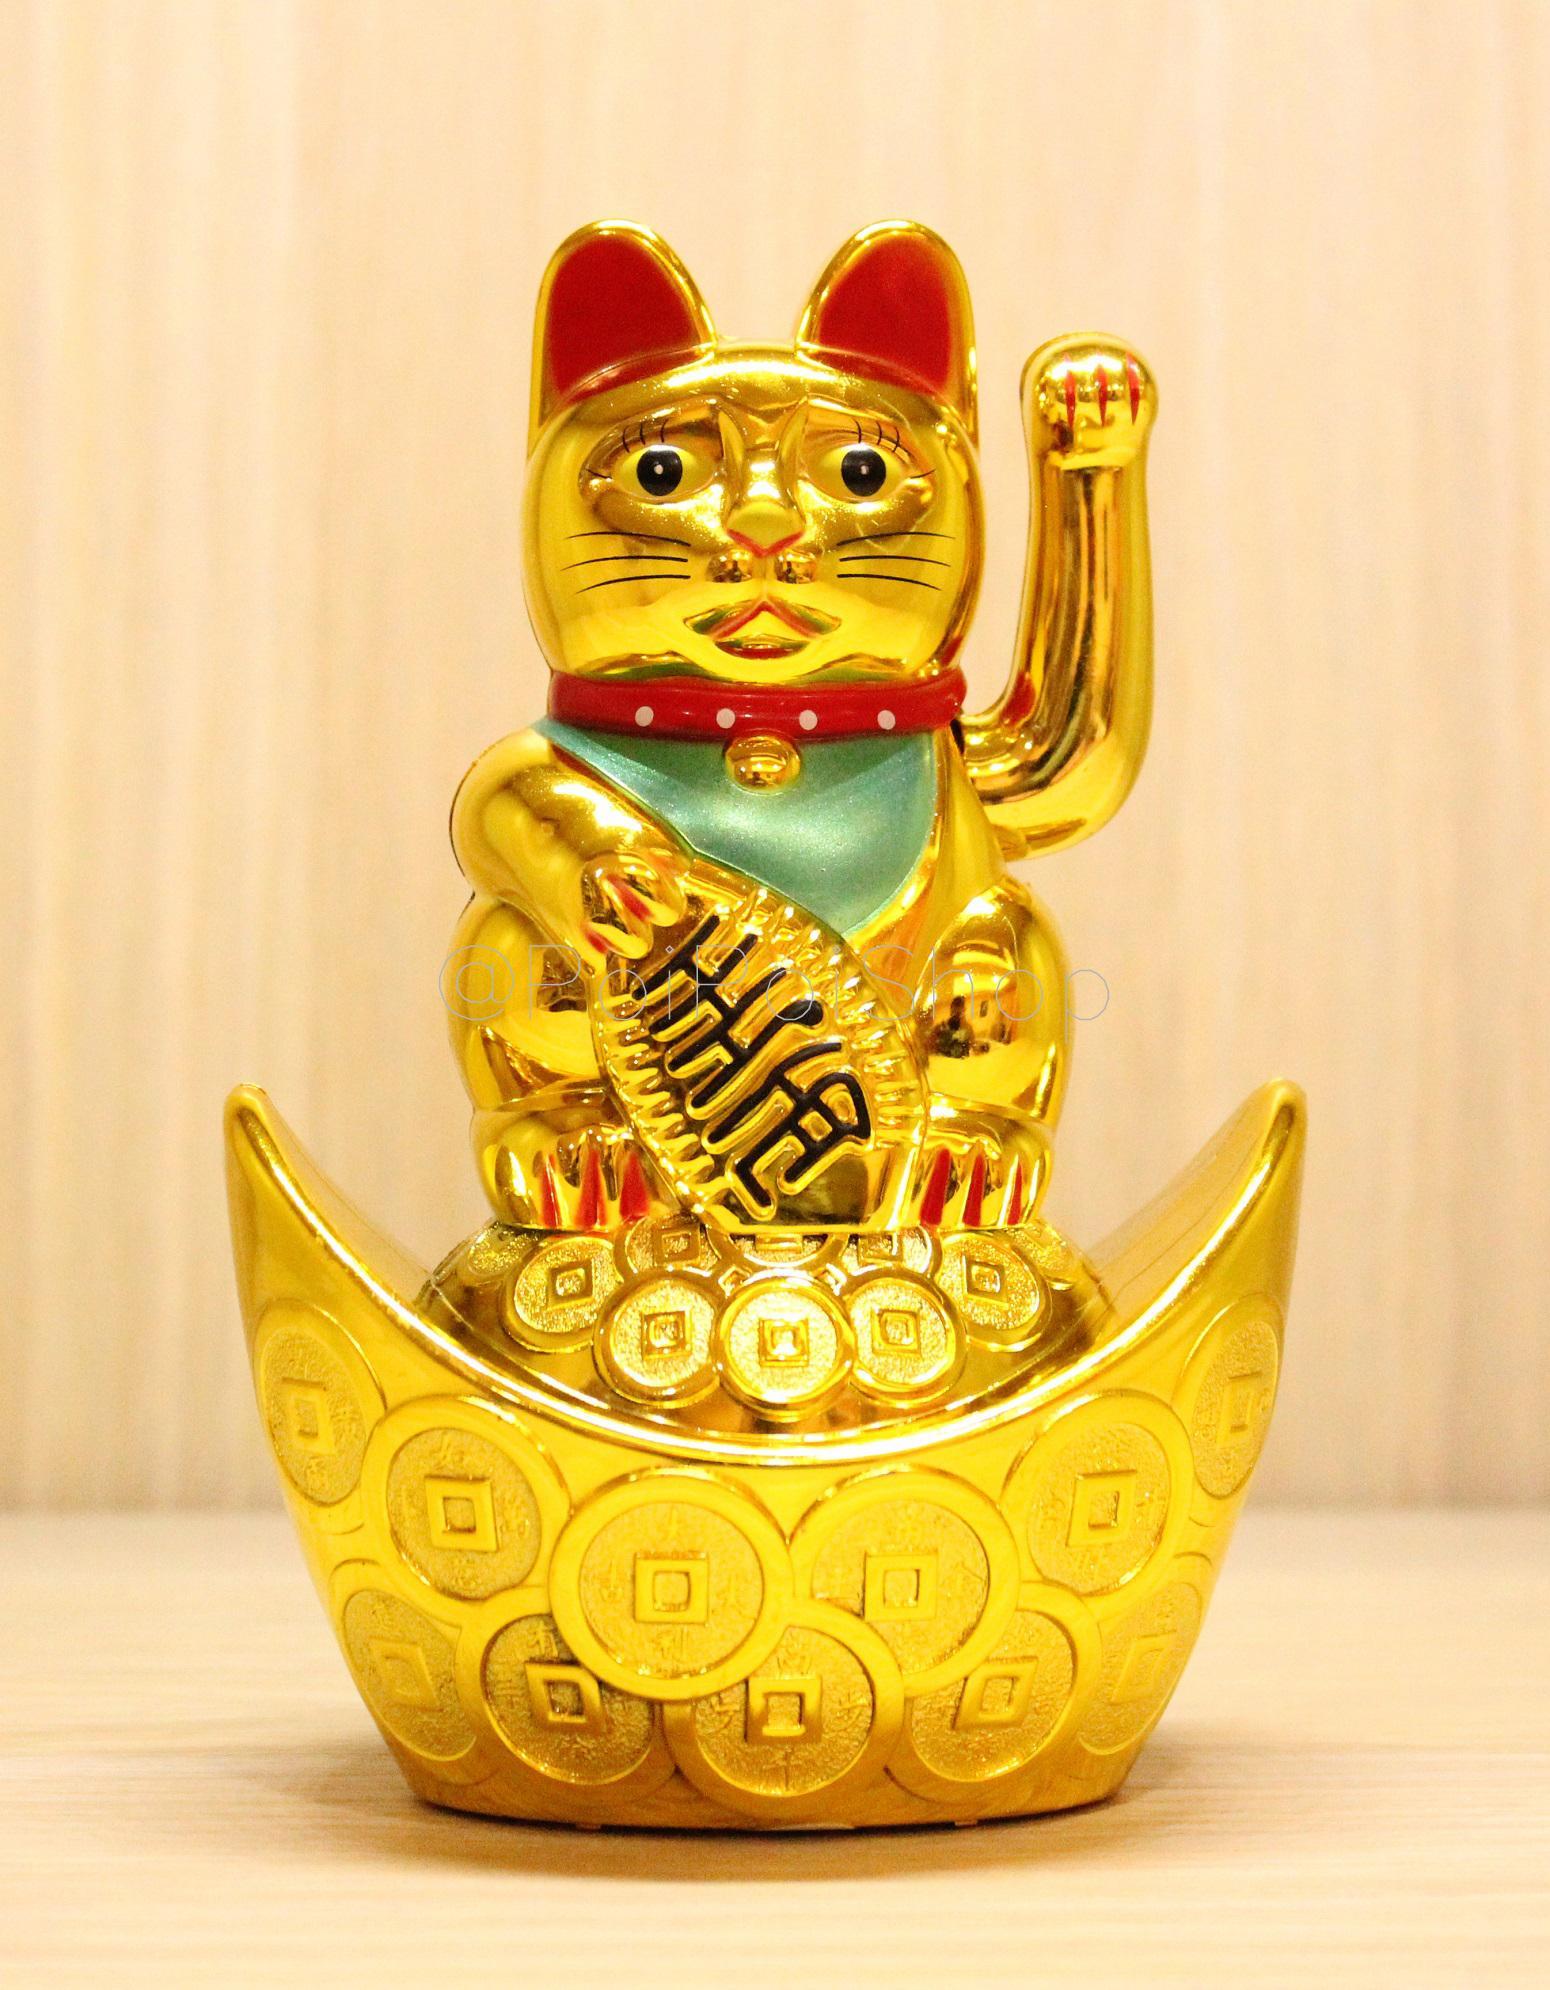 Download 76+  Gambar Kucing Rejeki Paling Keren HD